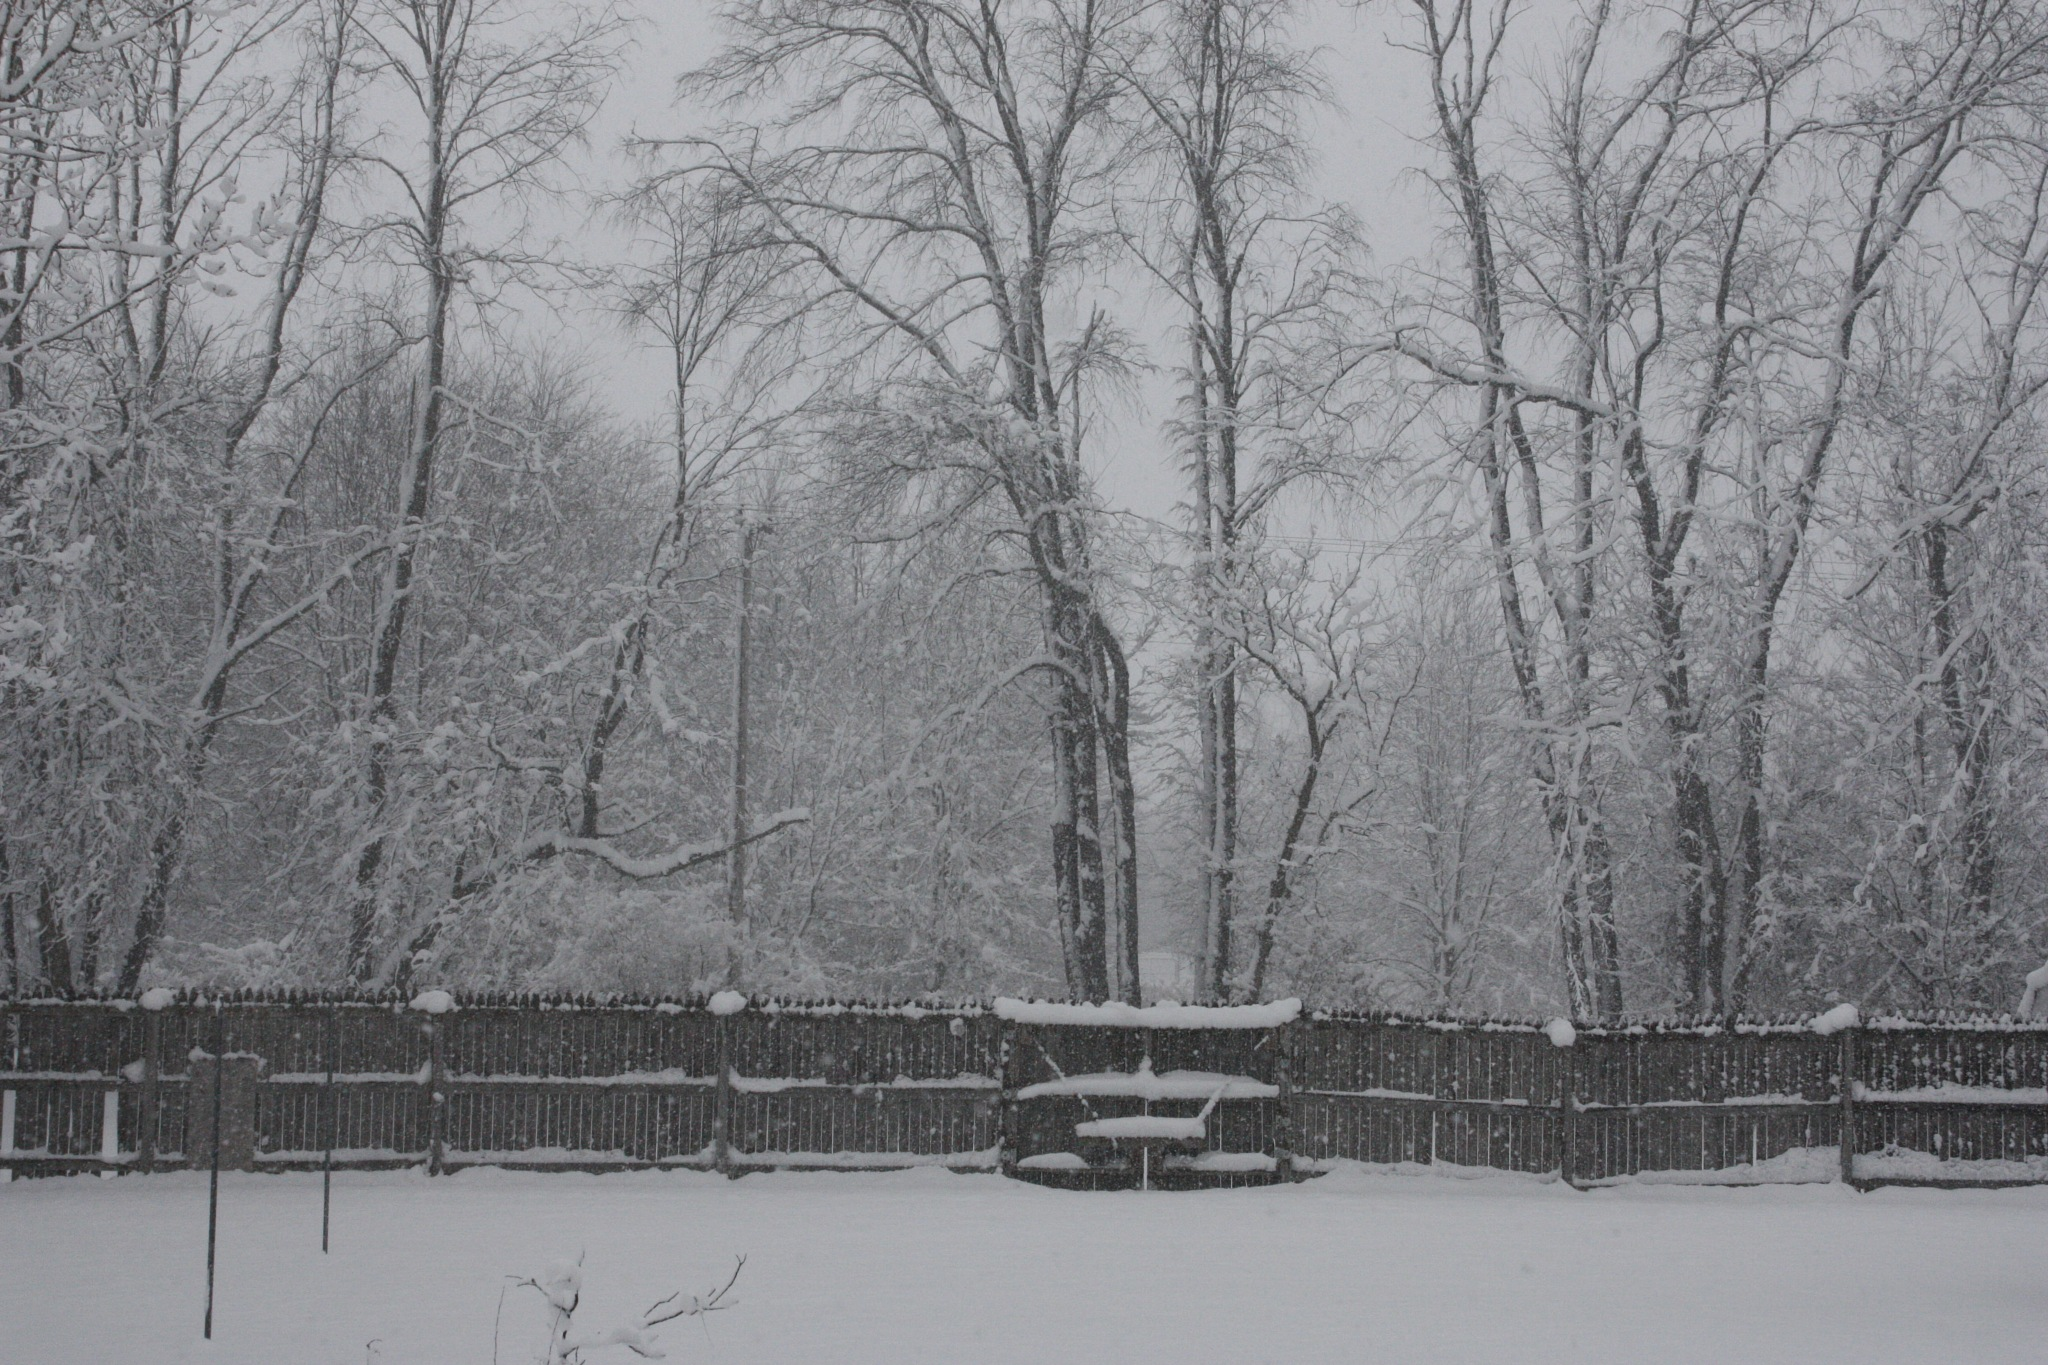 Winter in Michigan by dawnarie61